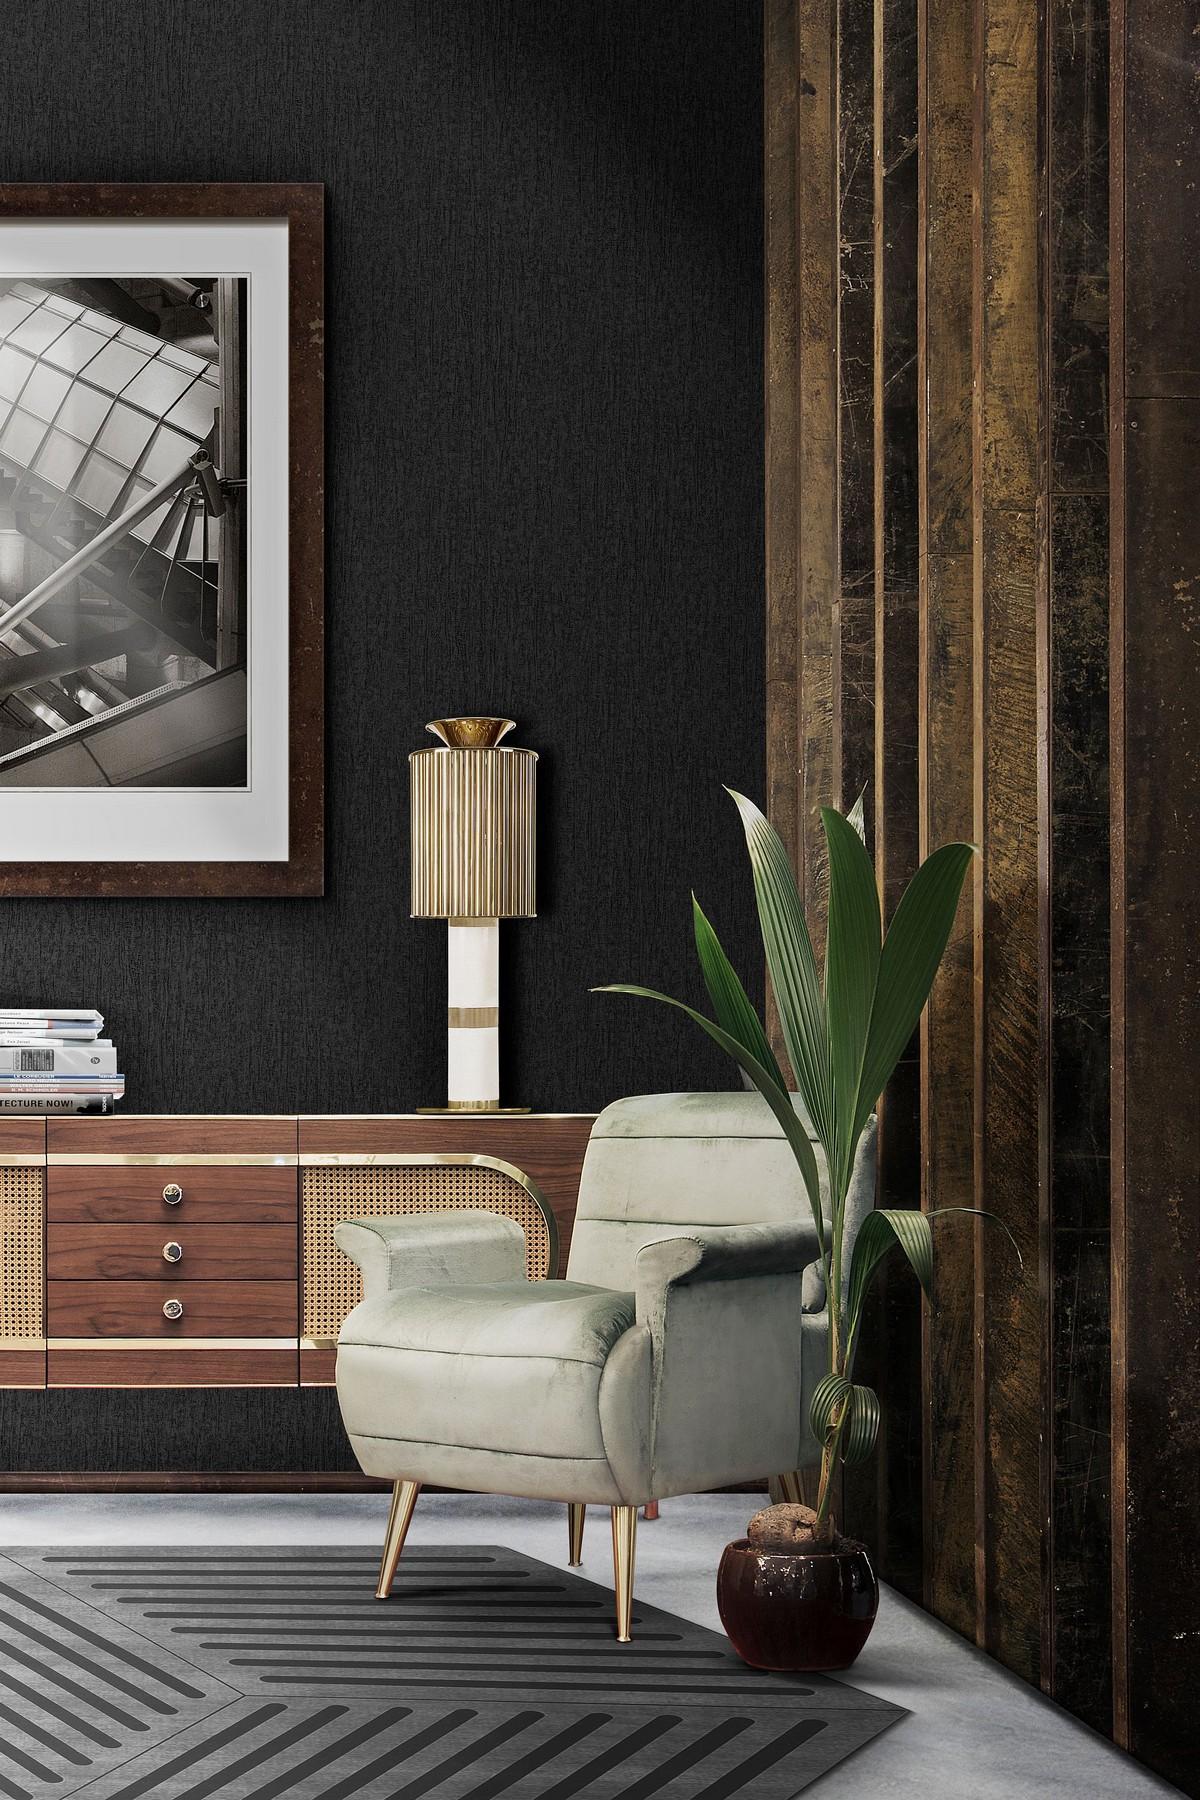 Exclusive Sideboards: When Vintage Meets Contemporary